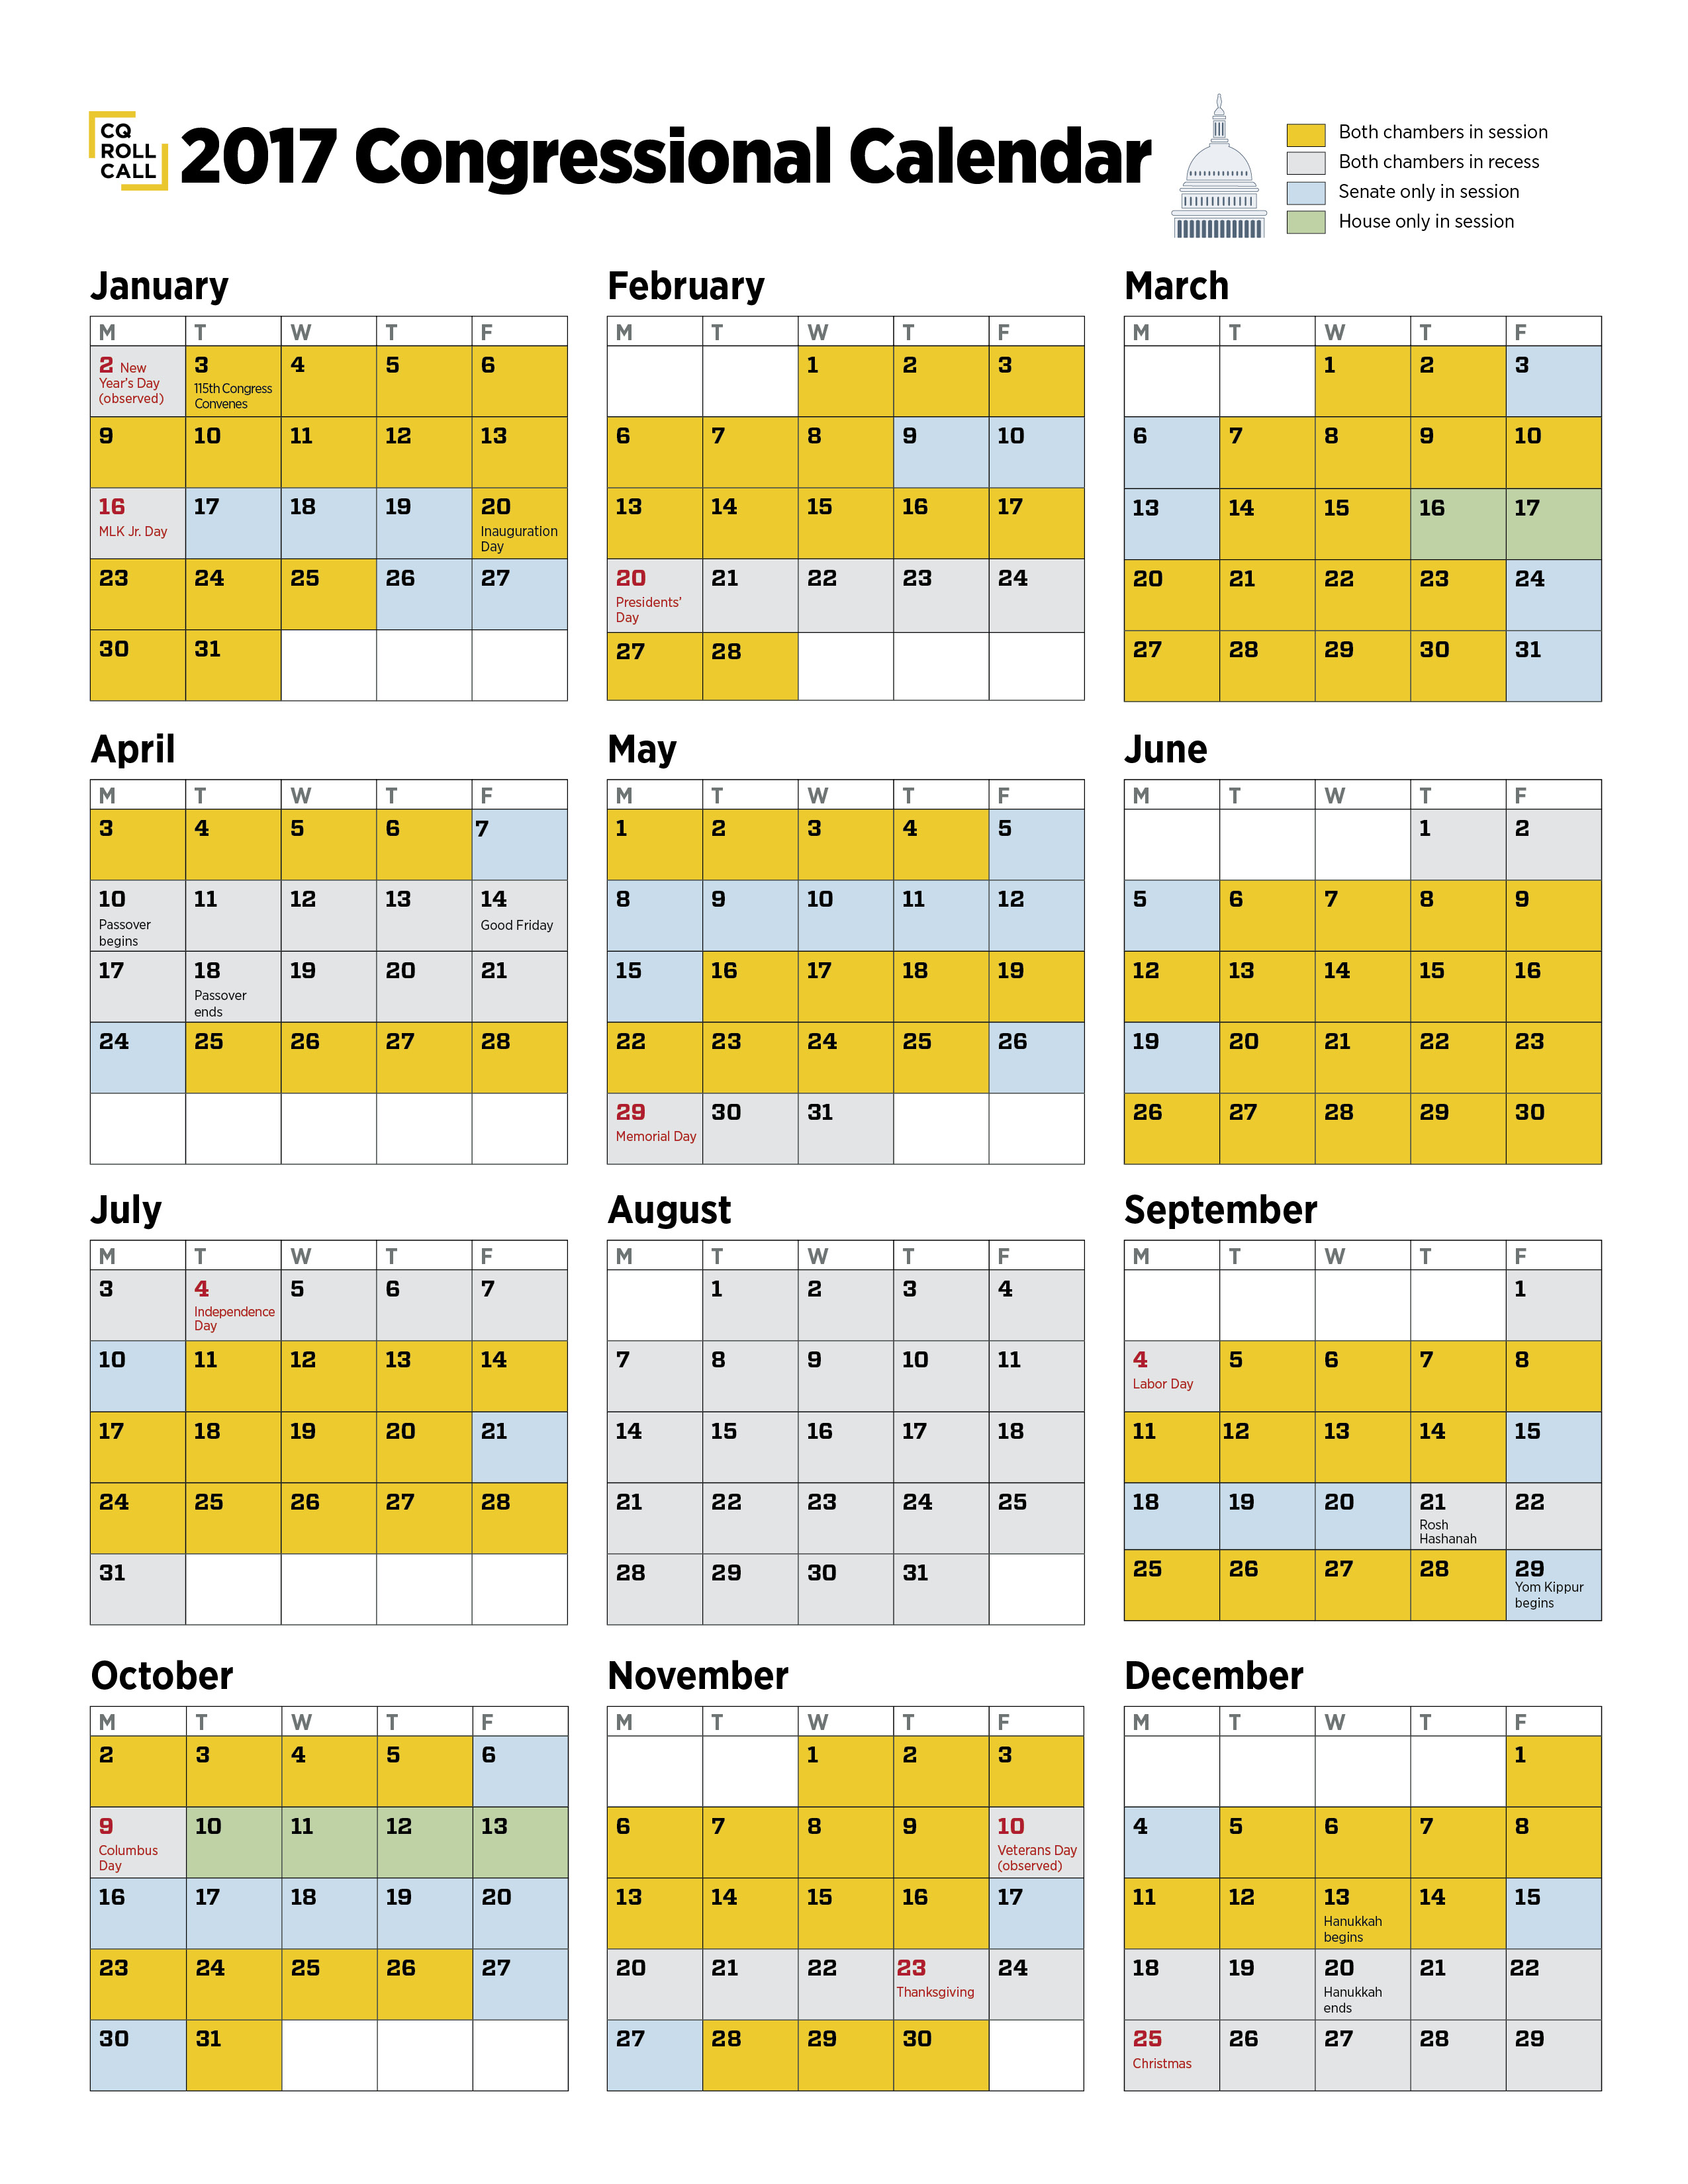 National Drink Days Calendar Mixology Diary New Congress Same Promises On Working Days Bipartisan